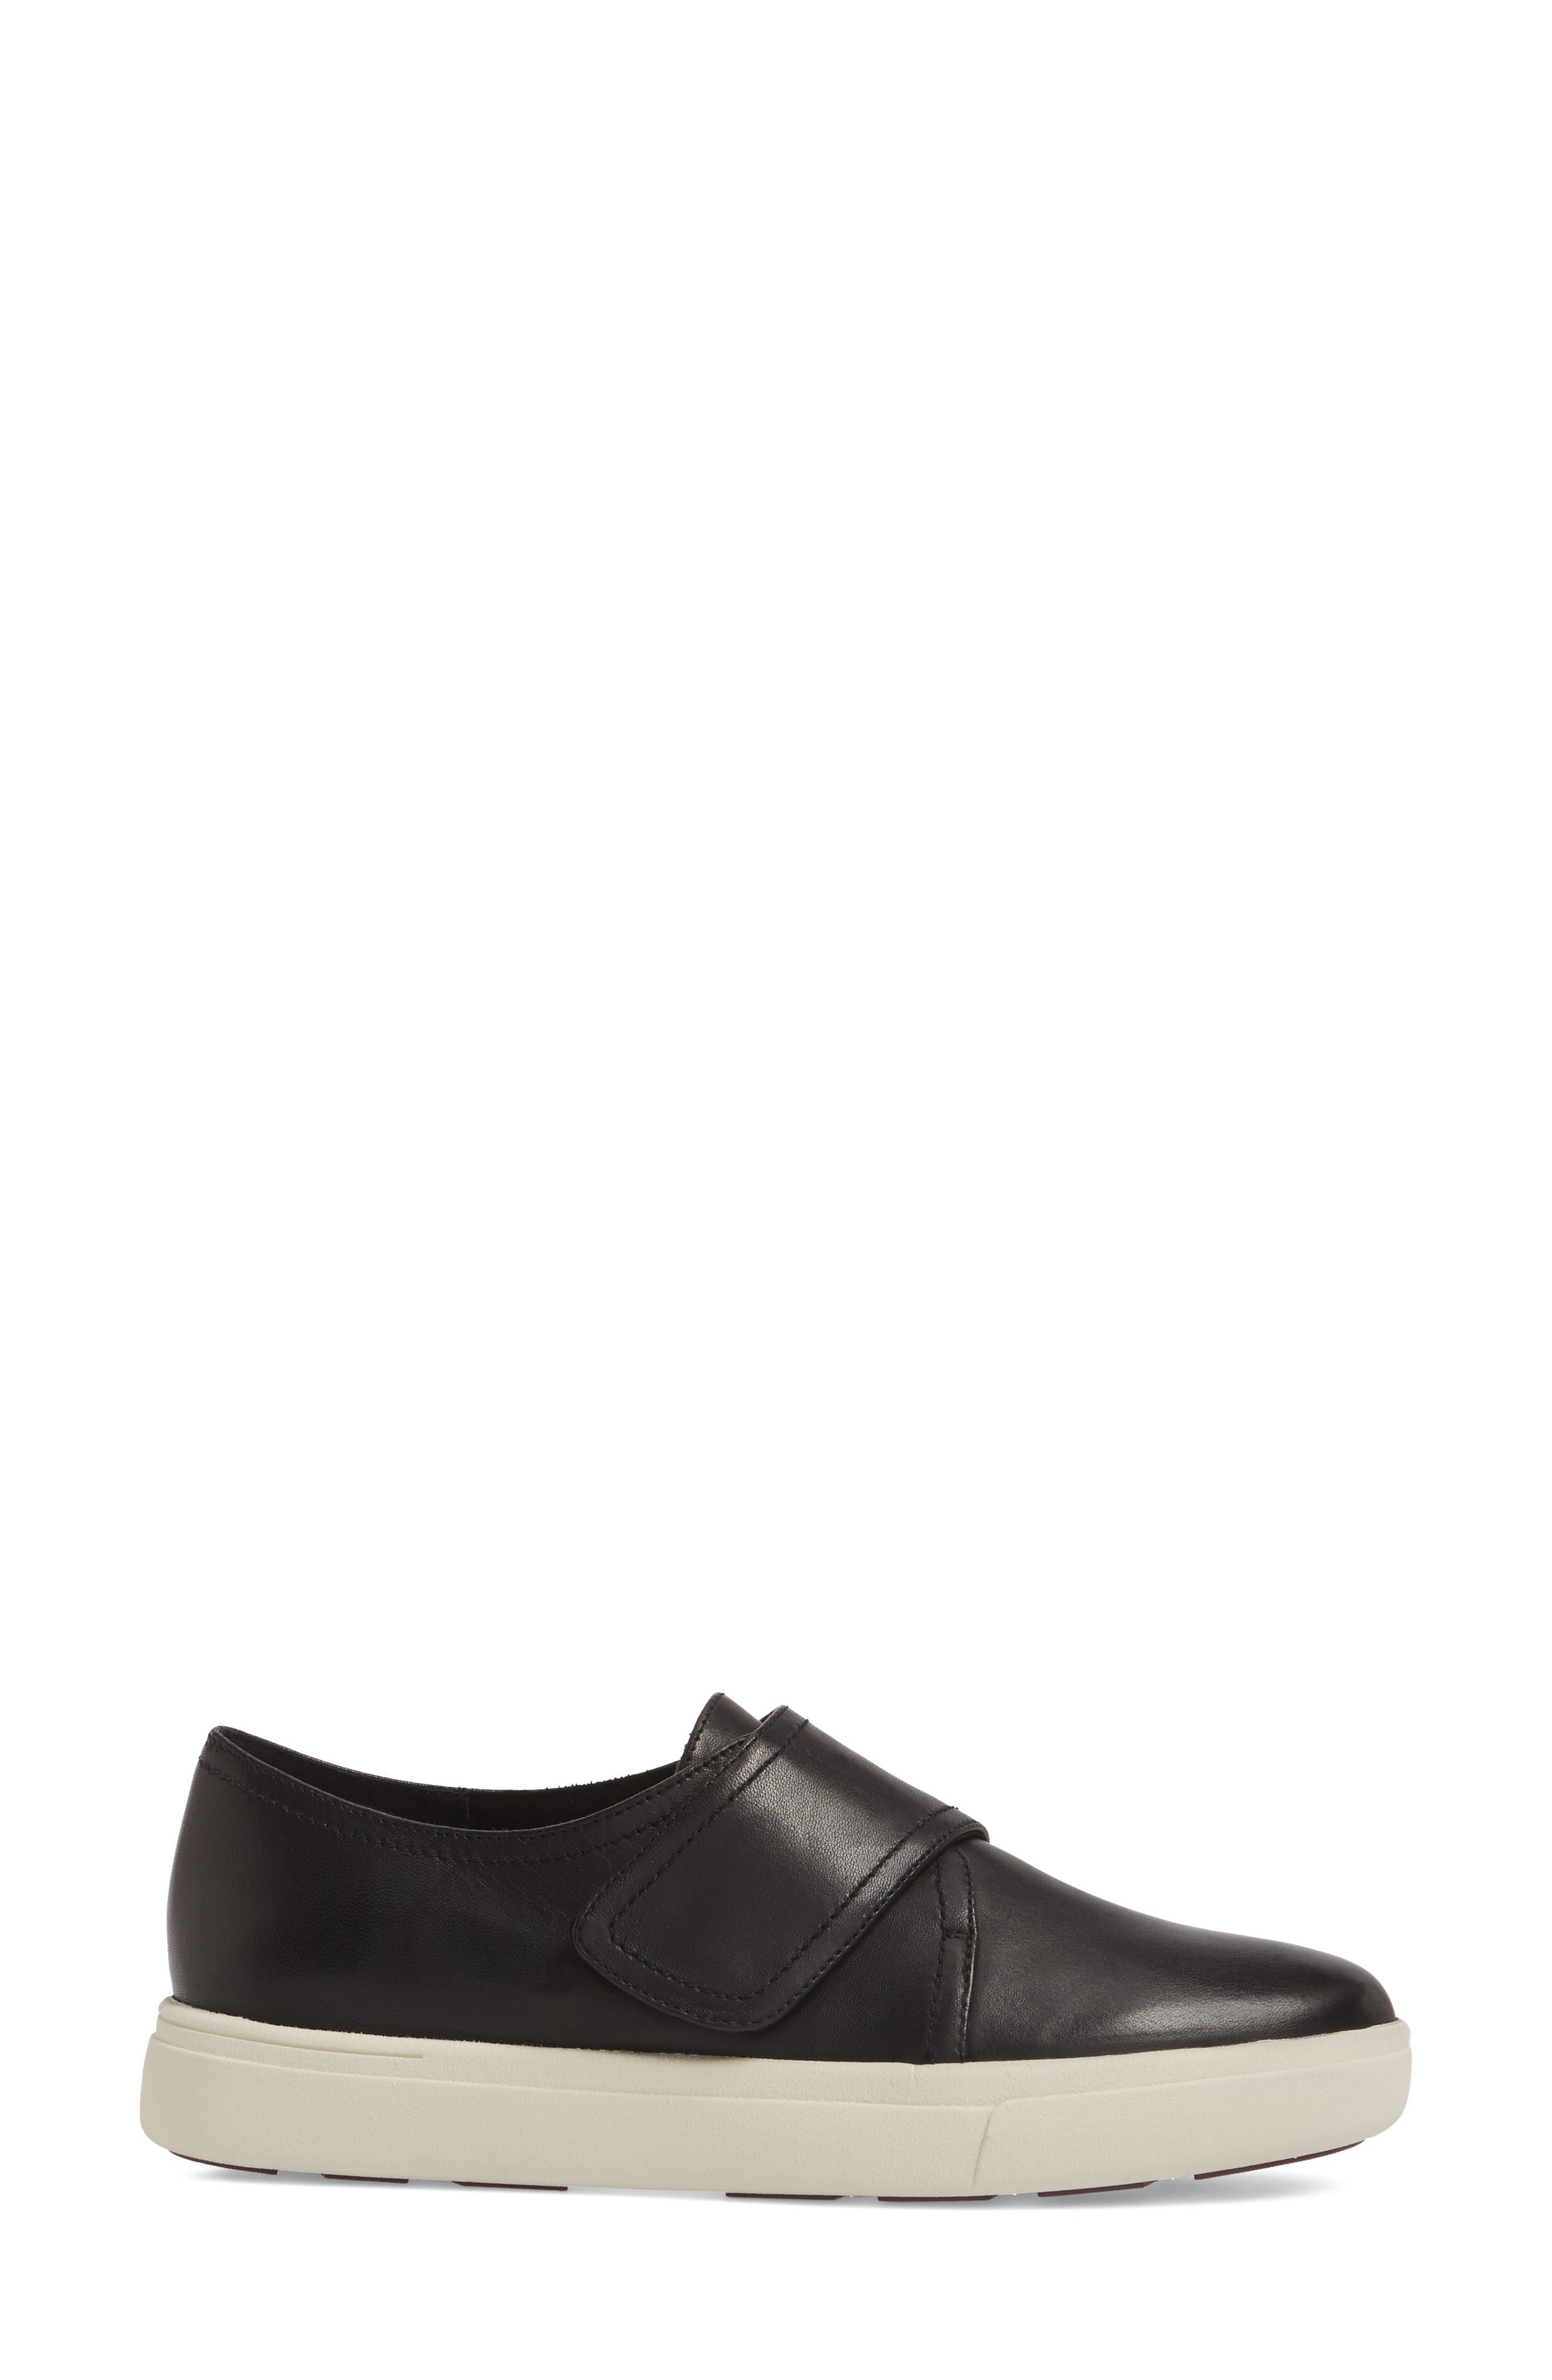 Oberon Slip-On Sneaker,                             Alternate thumbnail 3, color,                             Black Leather